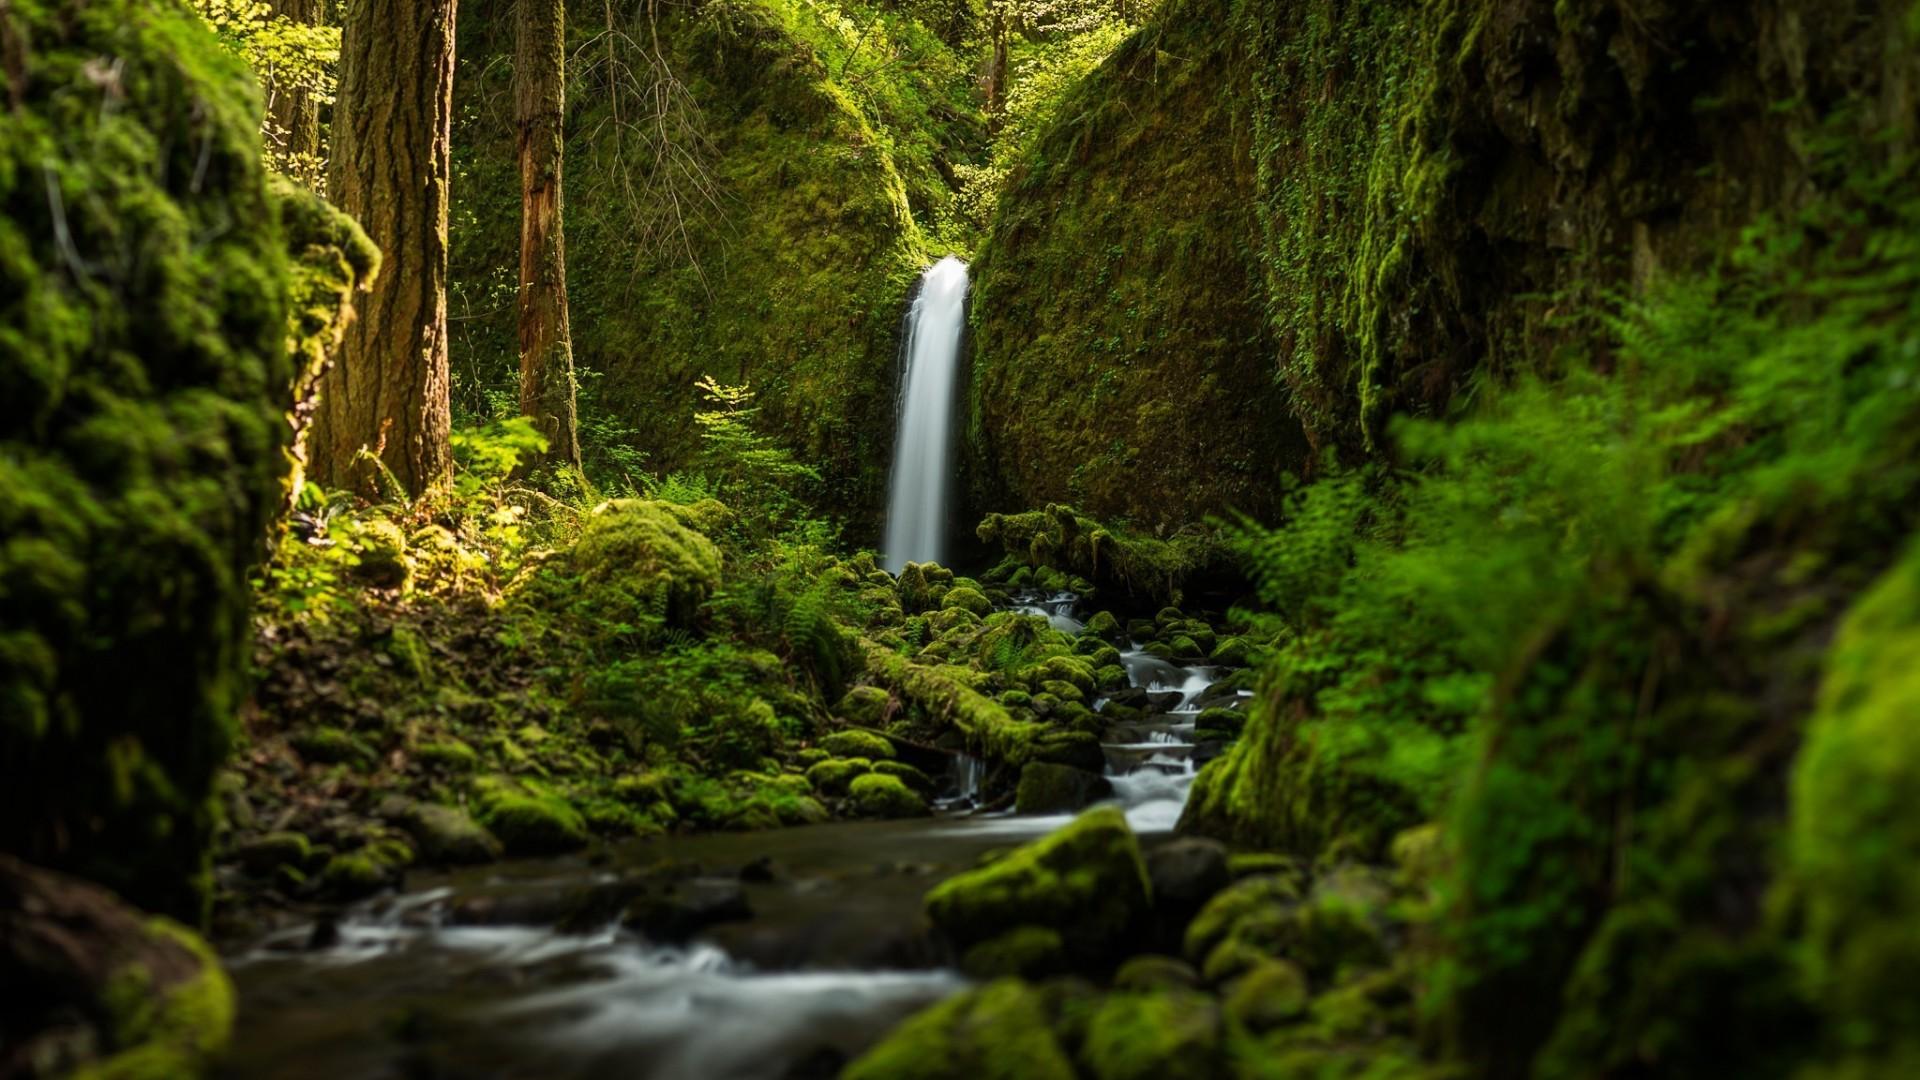 Nature forests oregon waterfalls ruckel creek falls - Oregon nature wallpaper ...